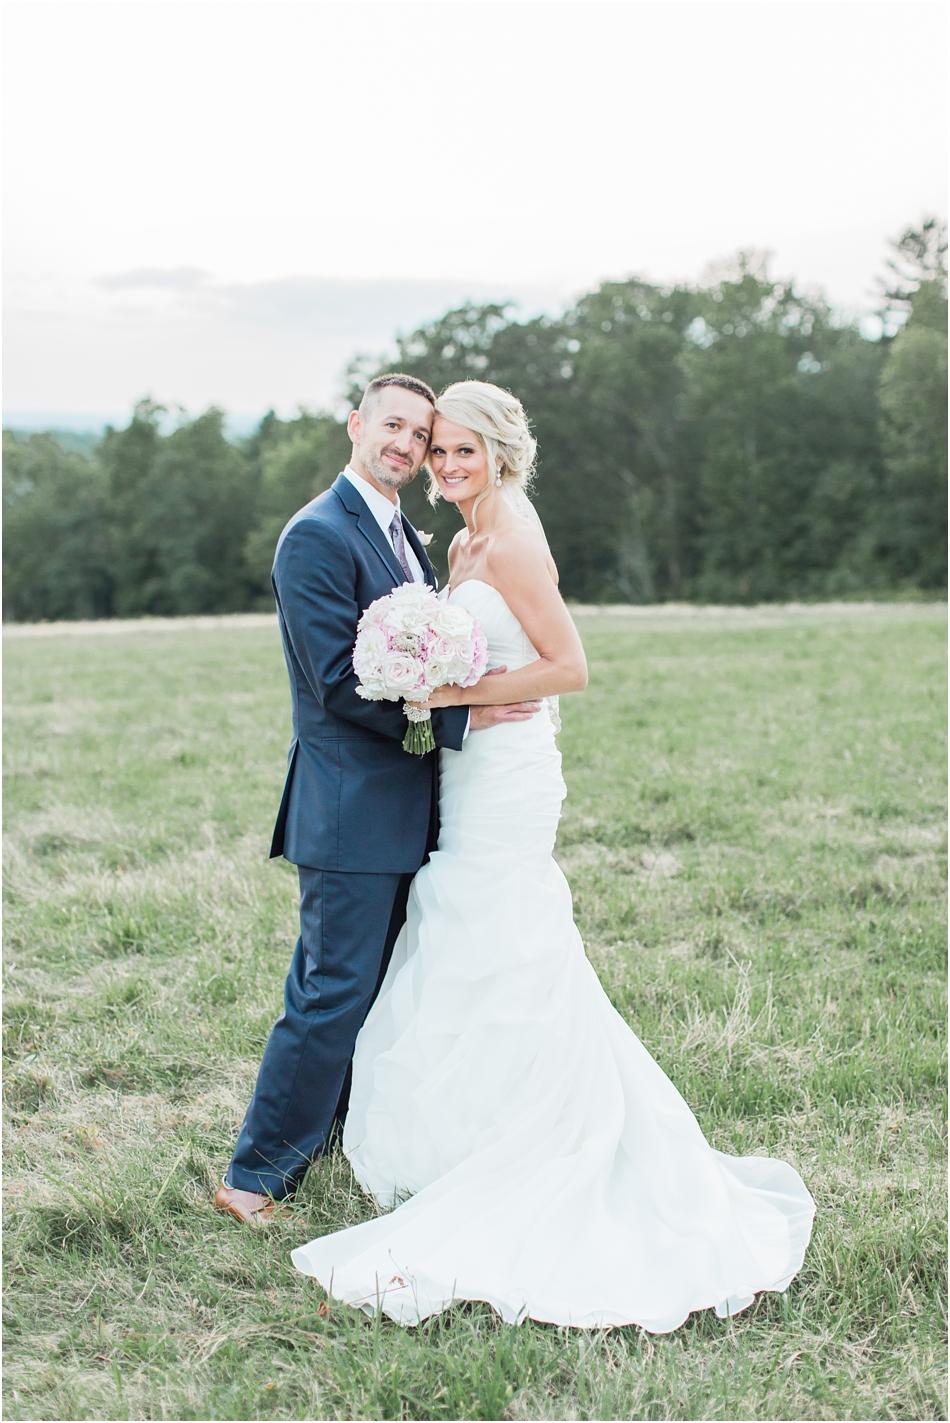 harrington_farm_leominster_sandra_jack_cape_cod_boston_new_england_wedding_photographer_Meredith_Jane_Photography_photo_2302.jpg